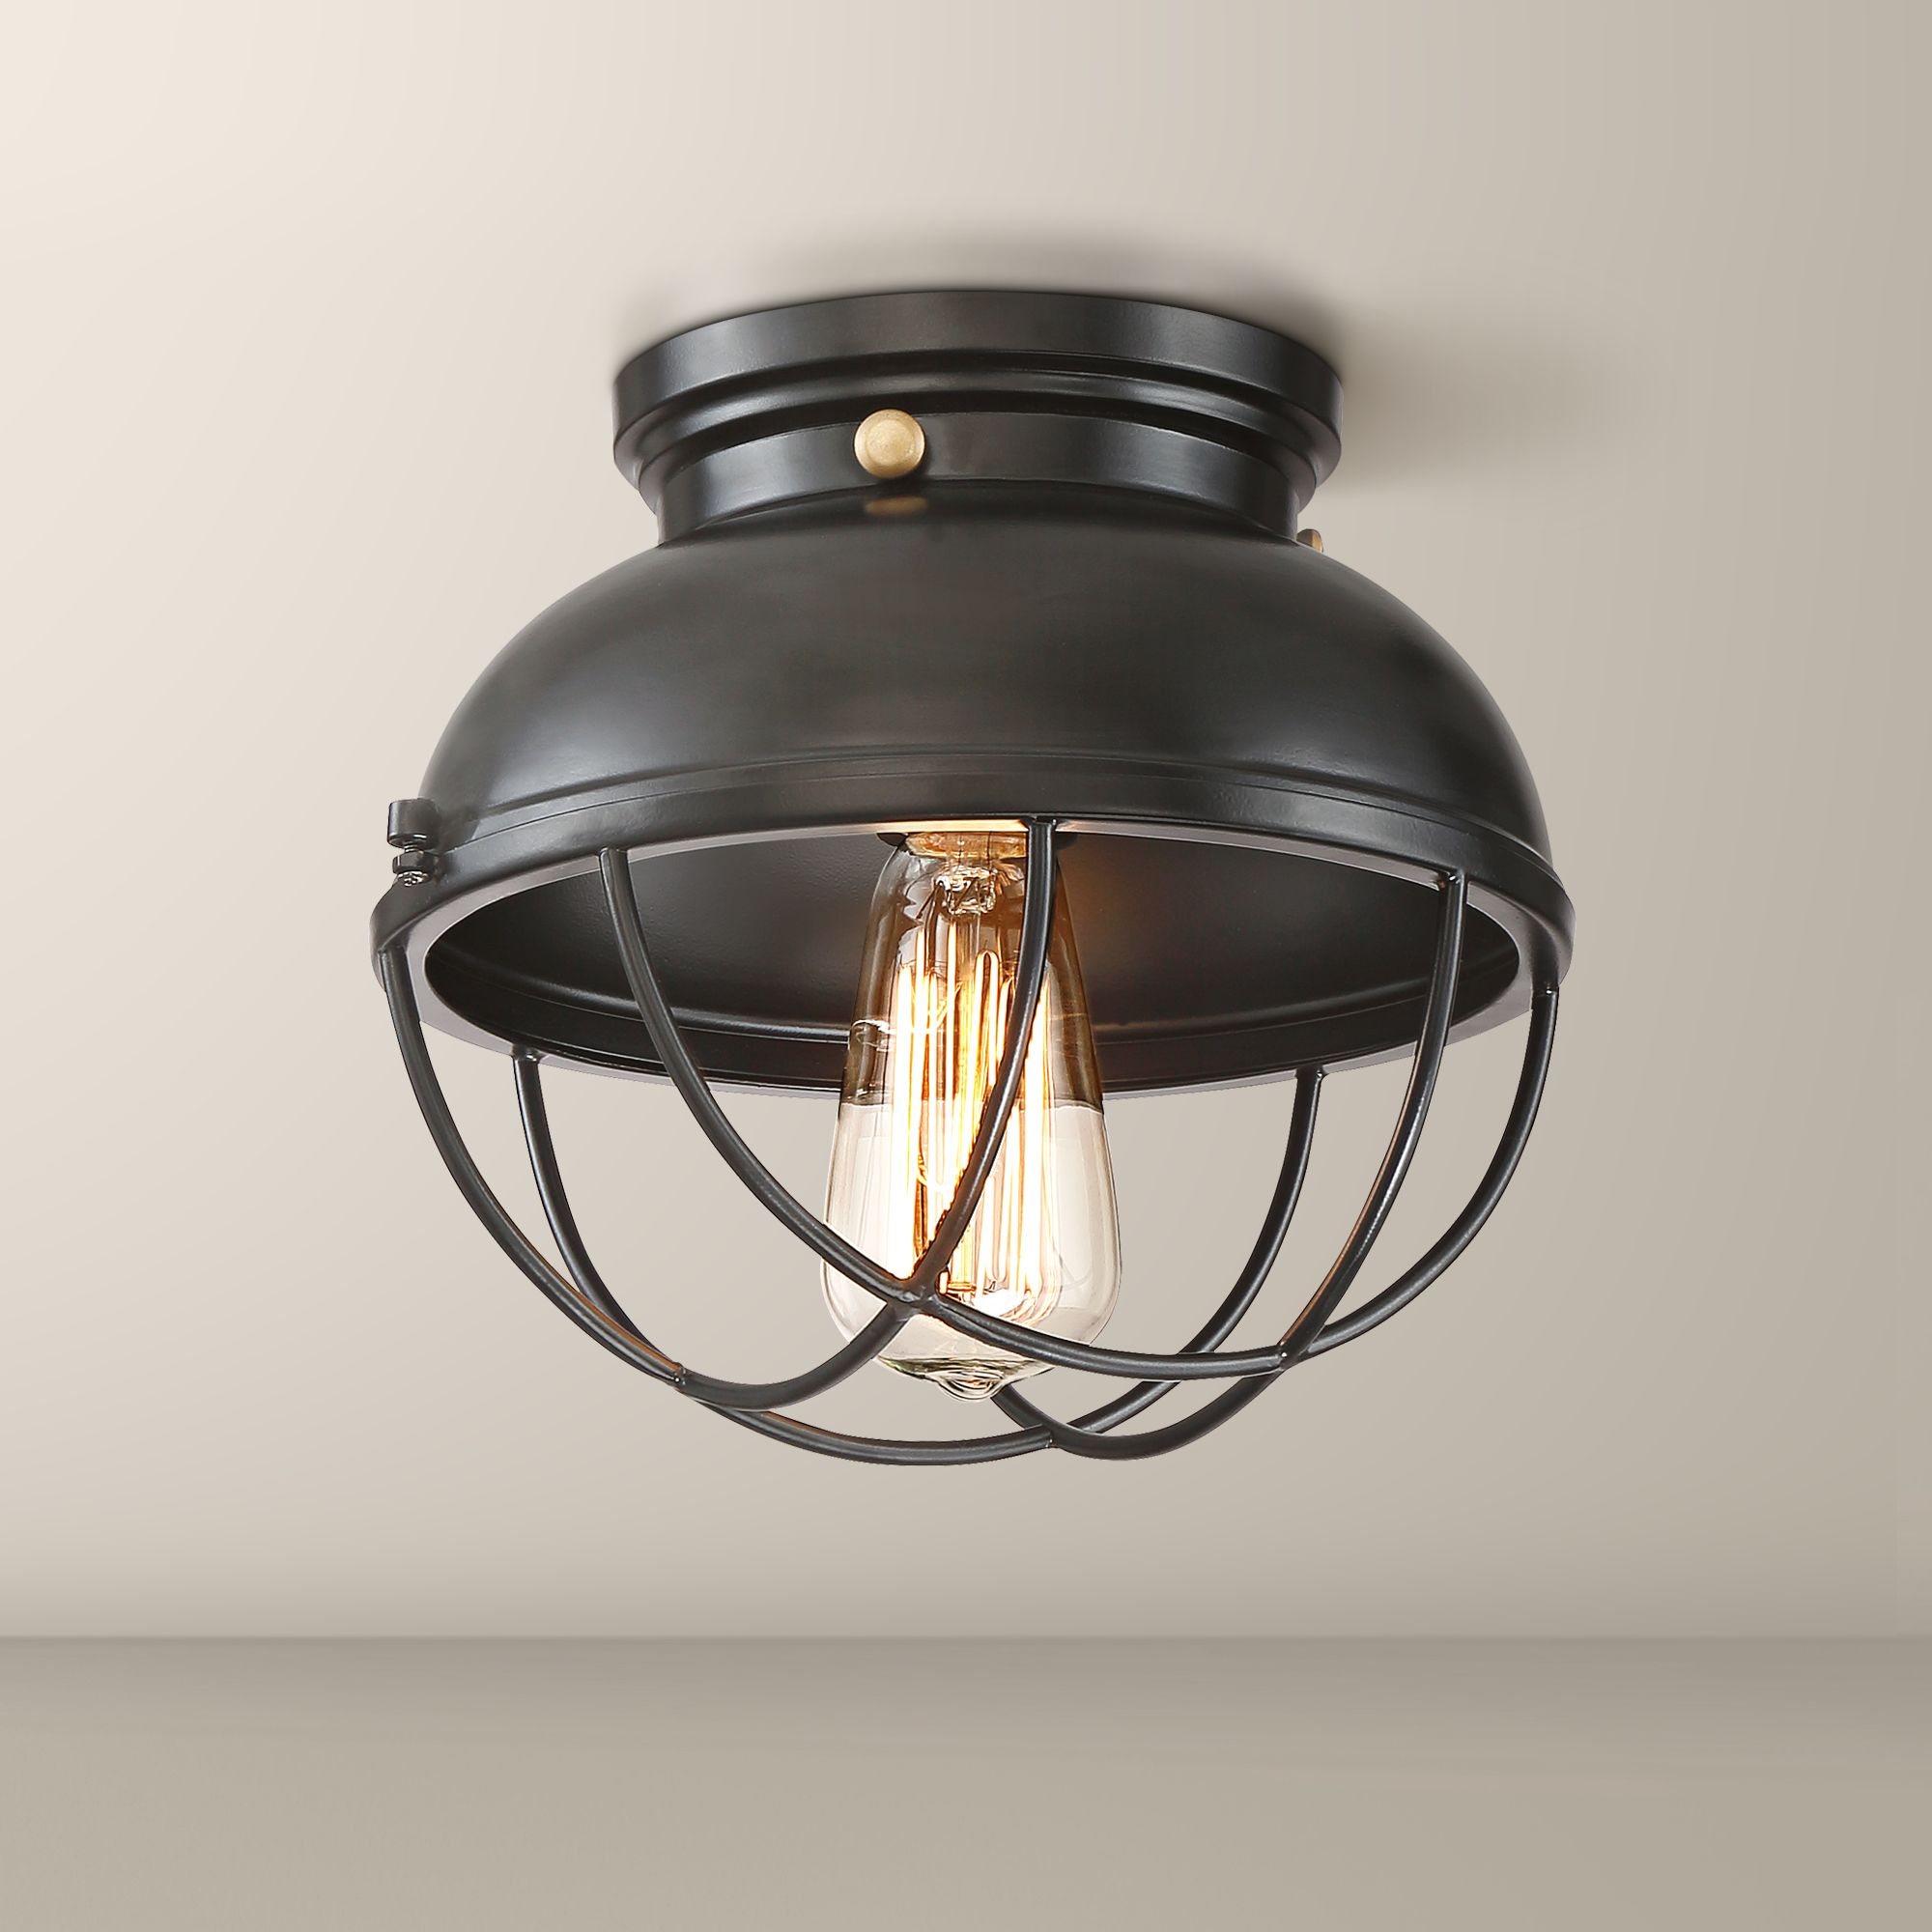 24W 36W 48W LED Ceiling Light Flush Mount Fixture Lamp ...  Kitchen Flush Mount Ceiling Light